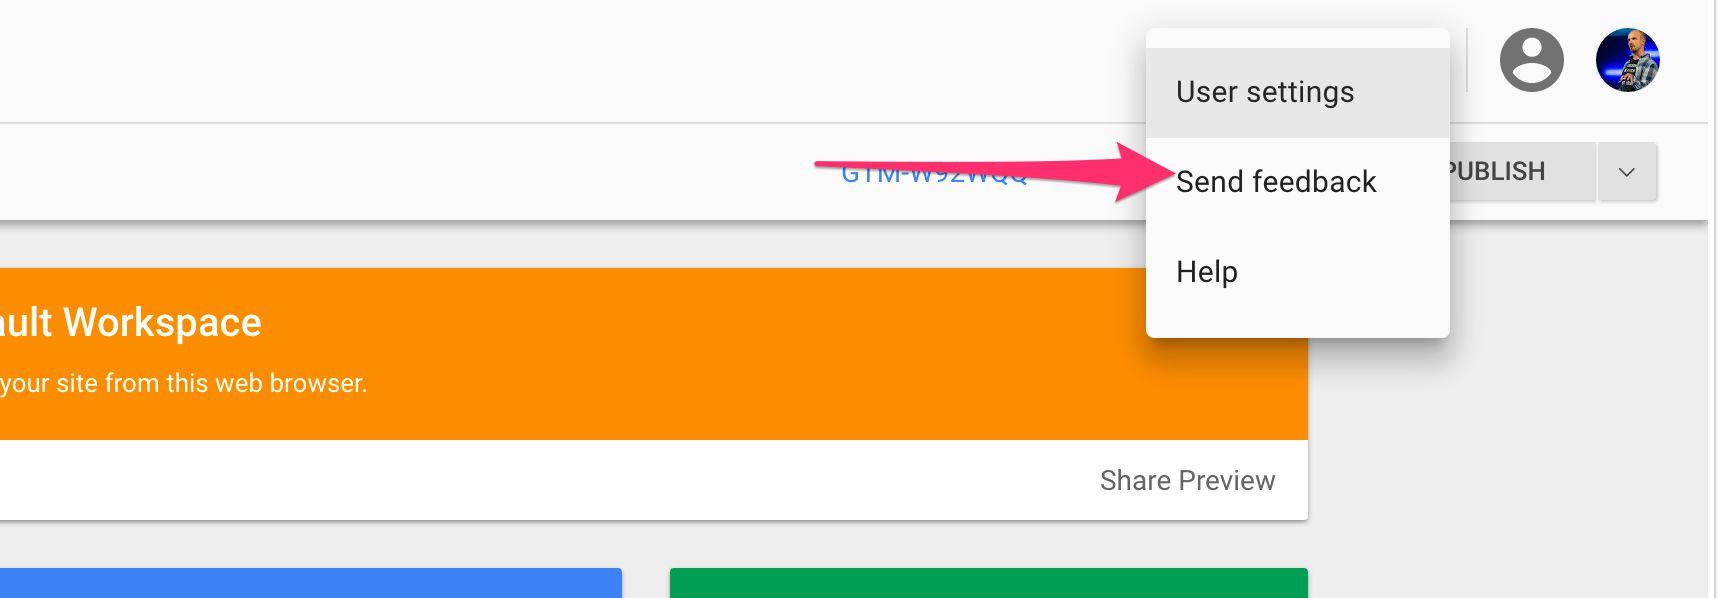 100+ Google Tag Manager Learnings | Simo Ahava's blog